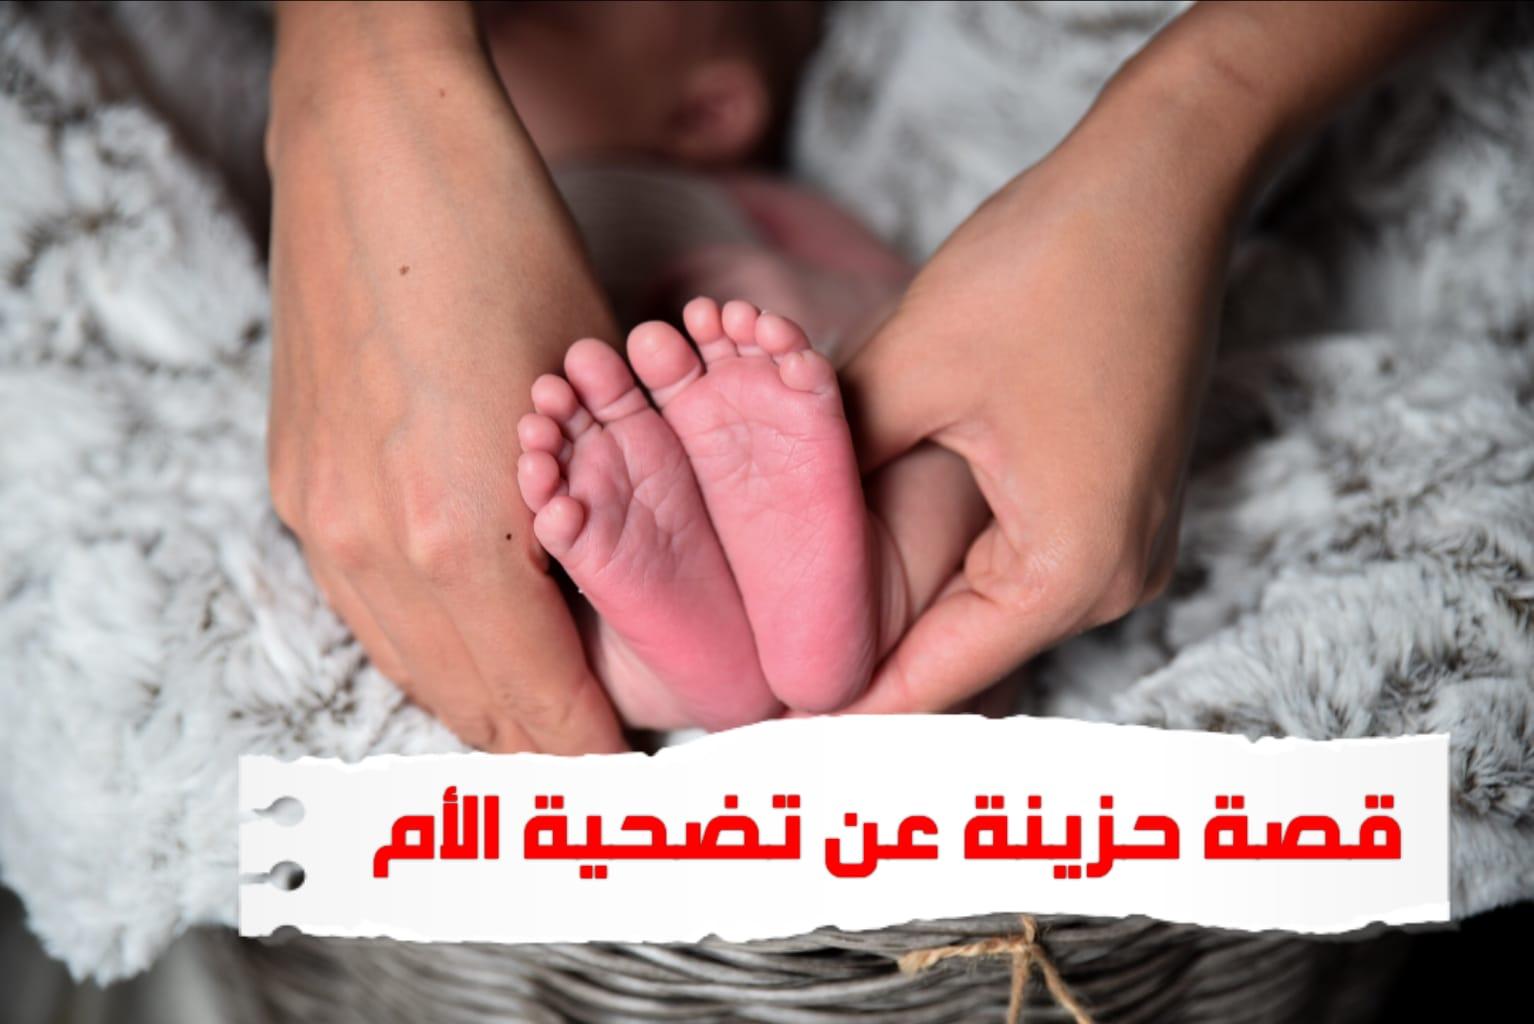 WhatsApp Image 2020 06 13 at 3.23.53 PM - قصة حزينة تضحية الأم لأجل حياة كريمة لإبنها